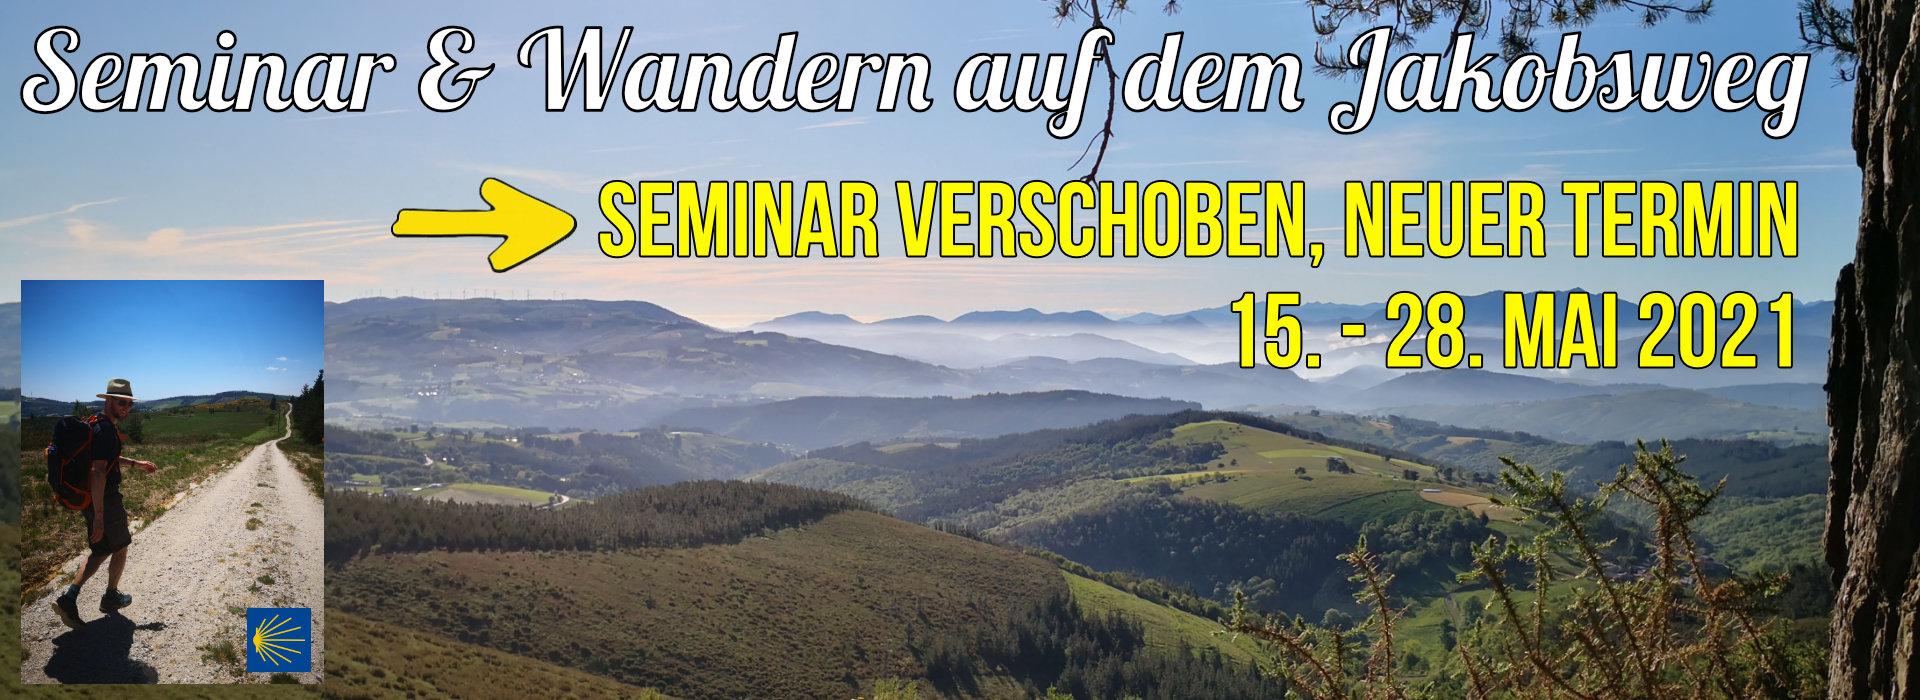 Jakobsweg Seminar 2021